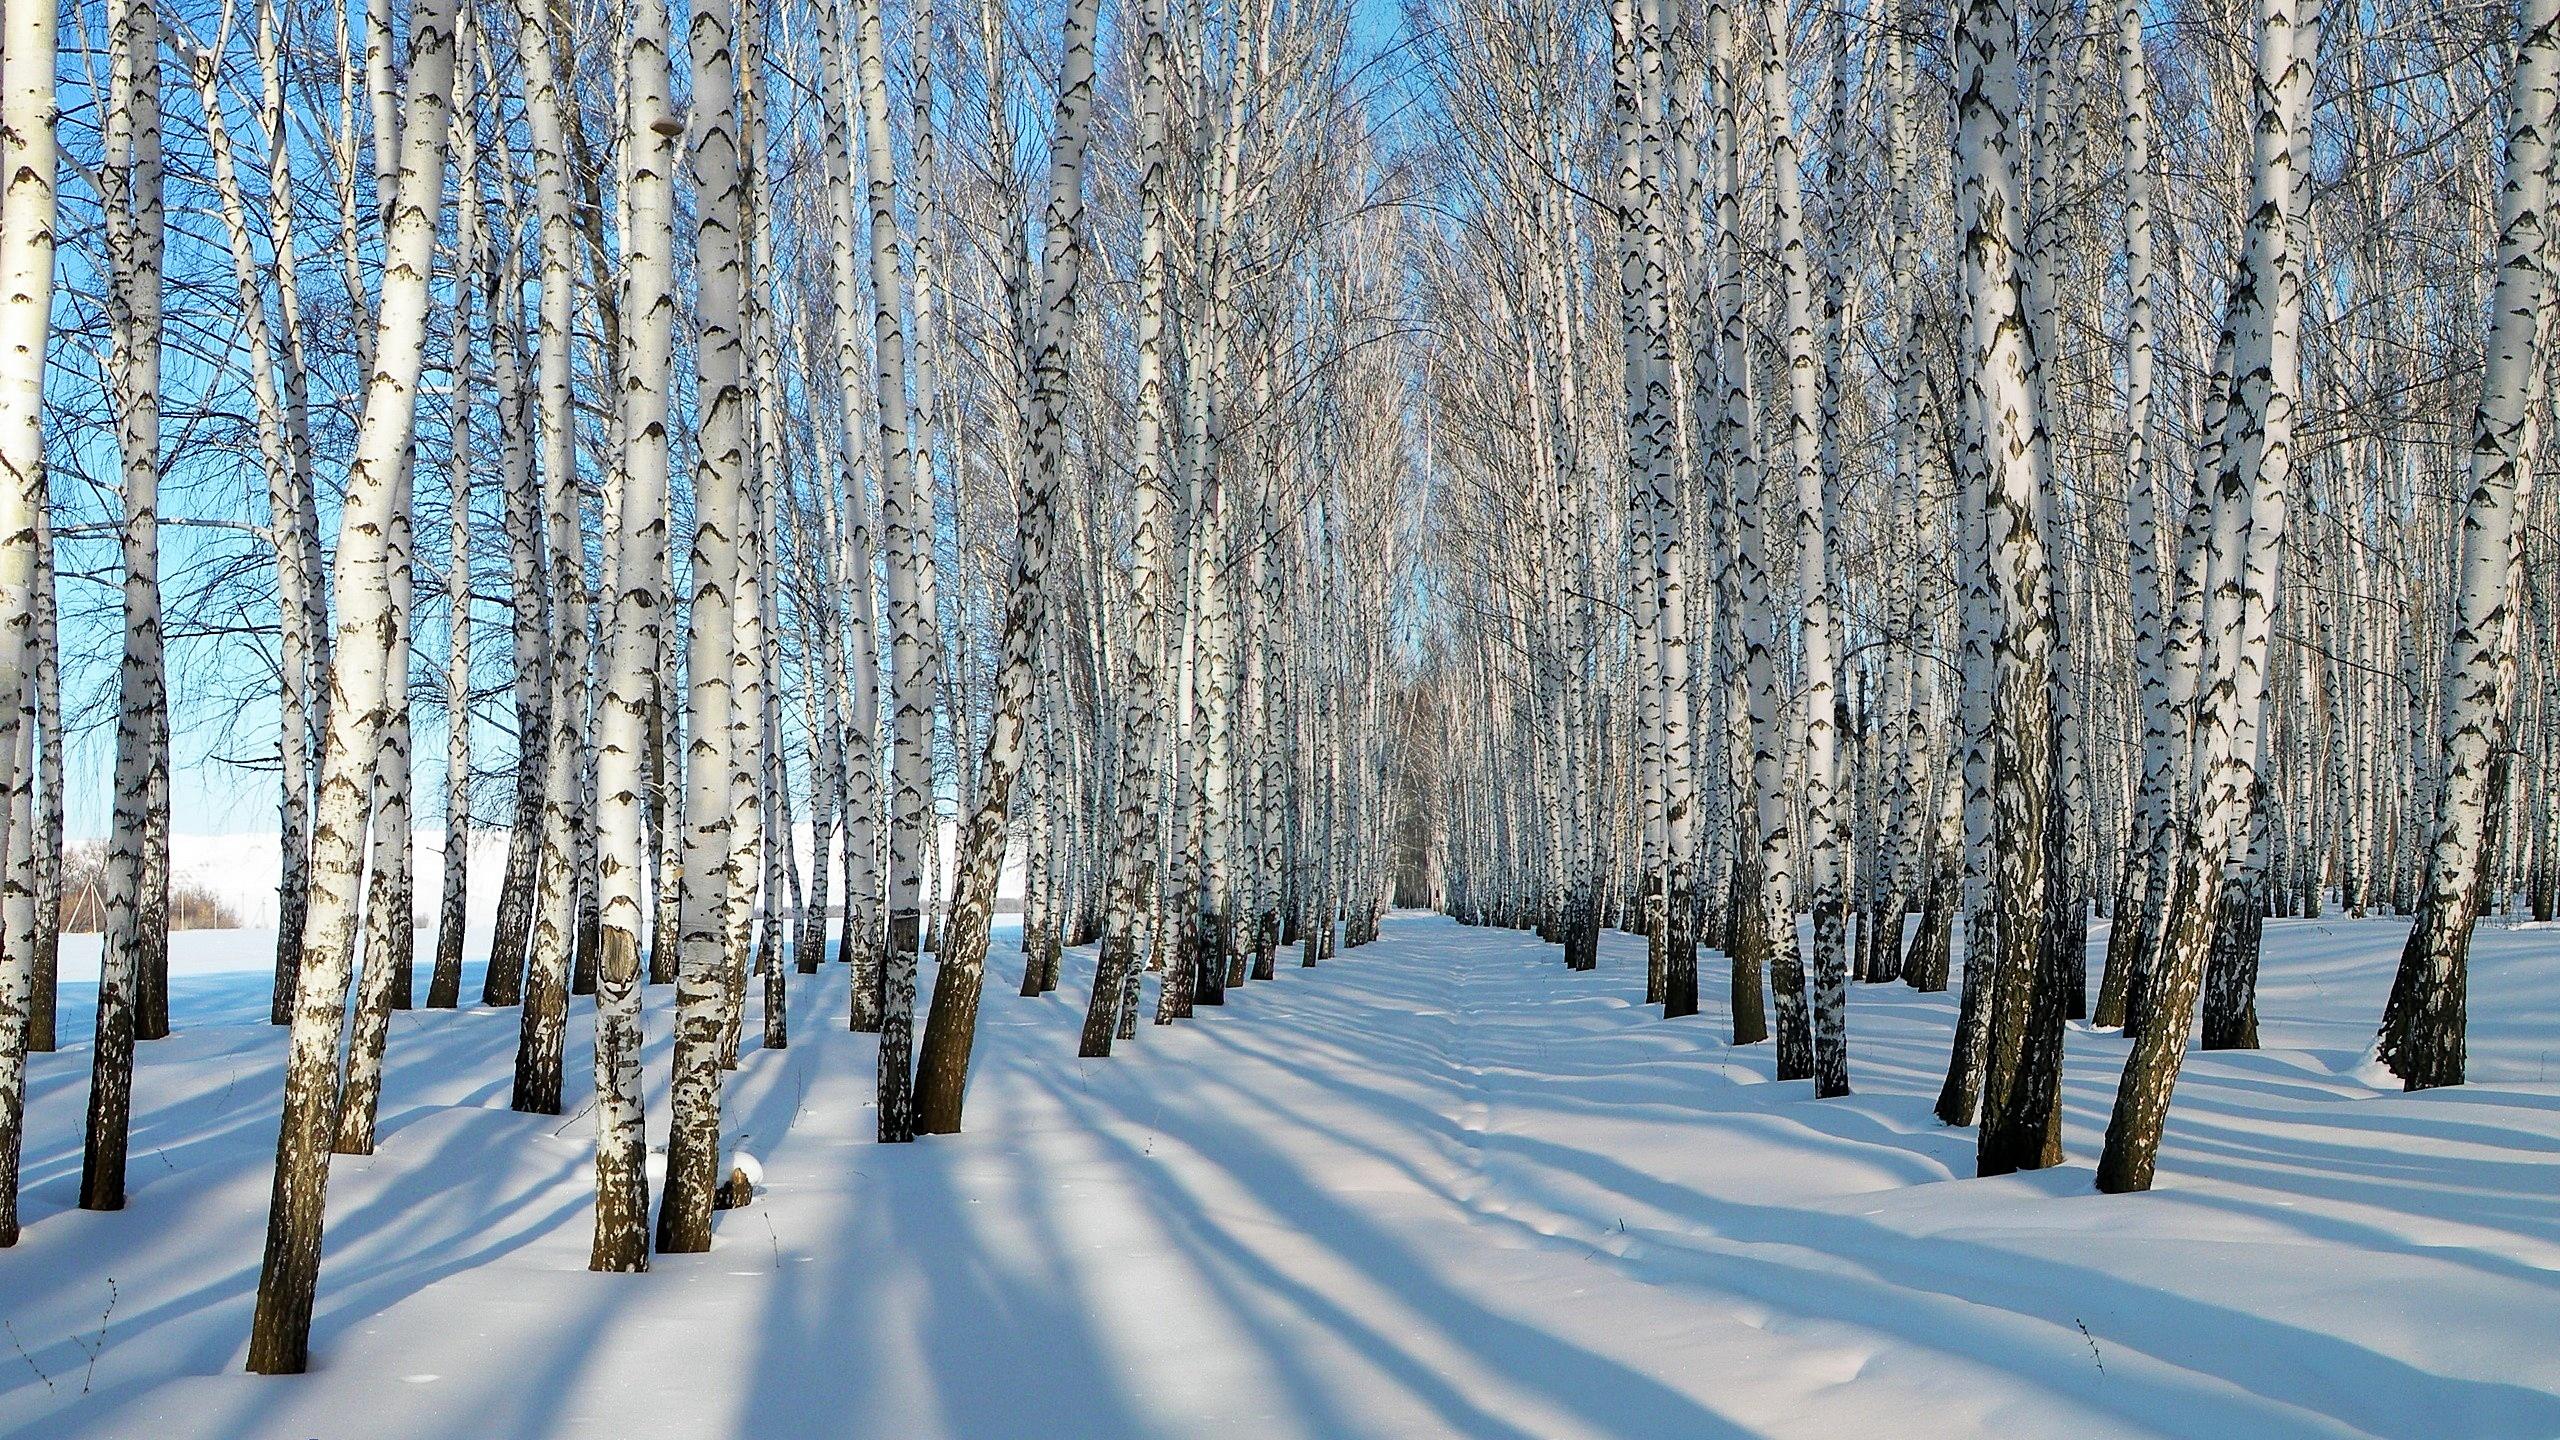 Winter Birch Trees wallpaper   1019964 2560x1440